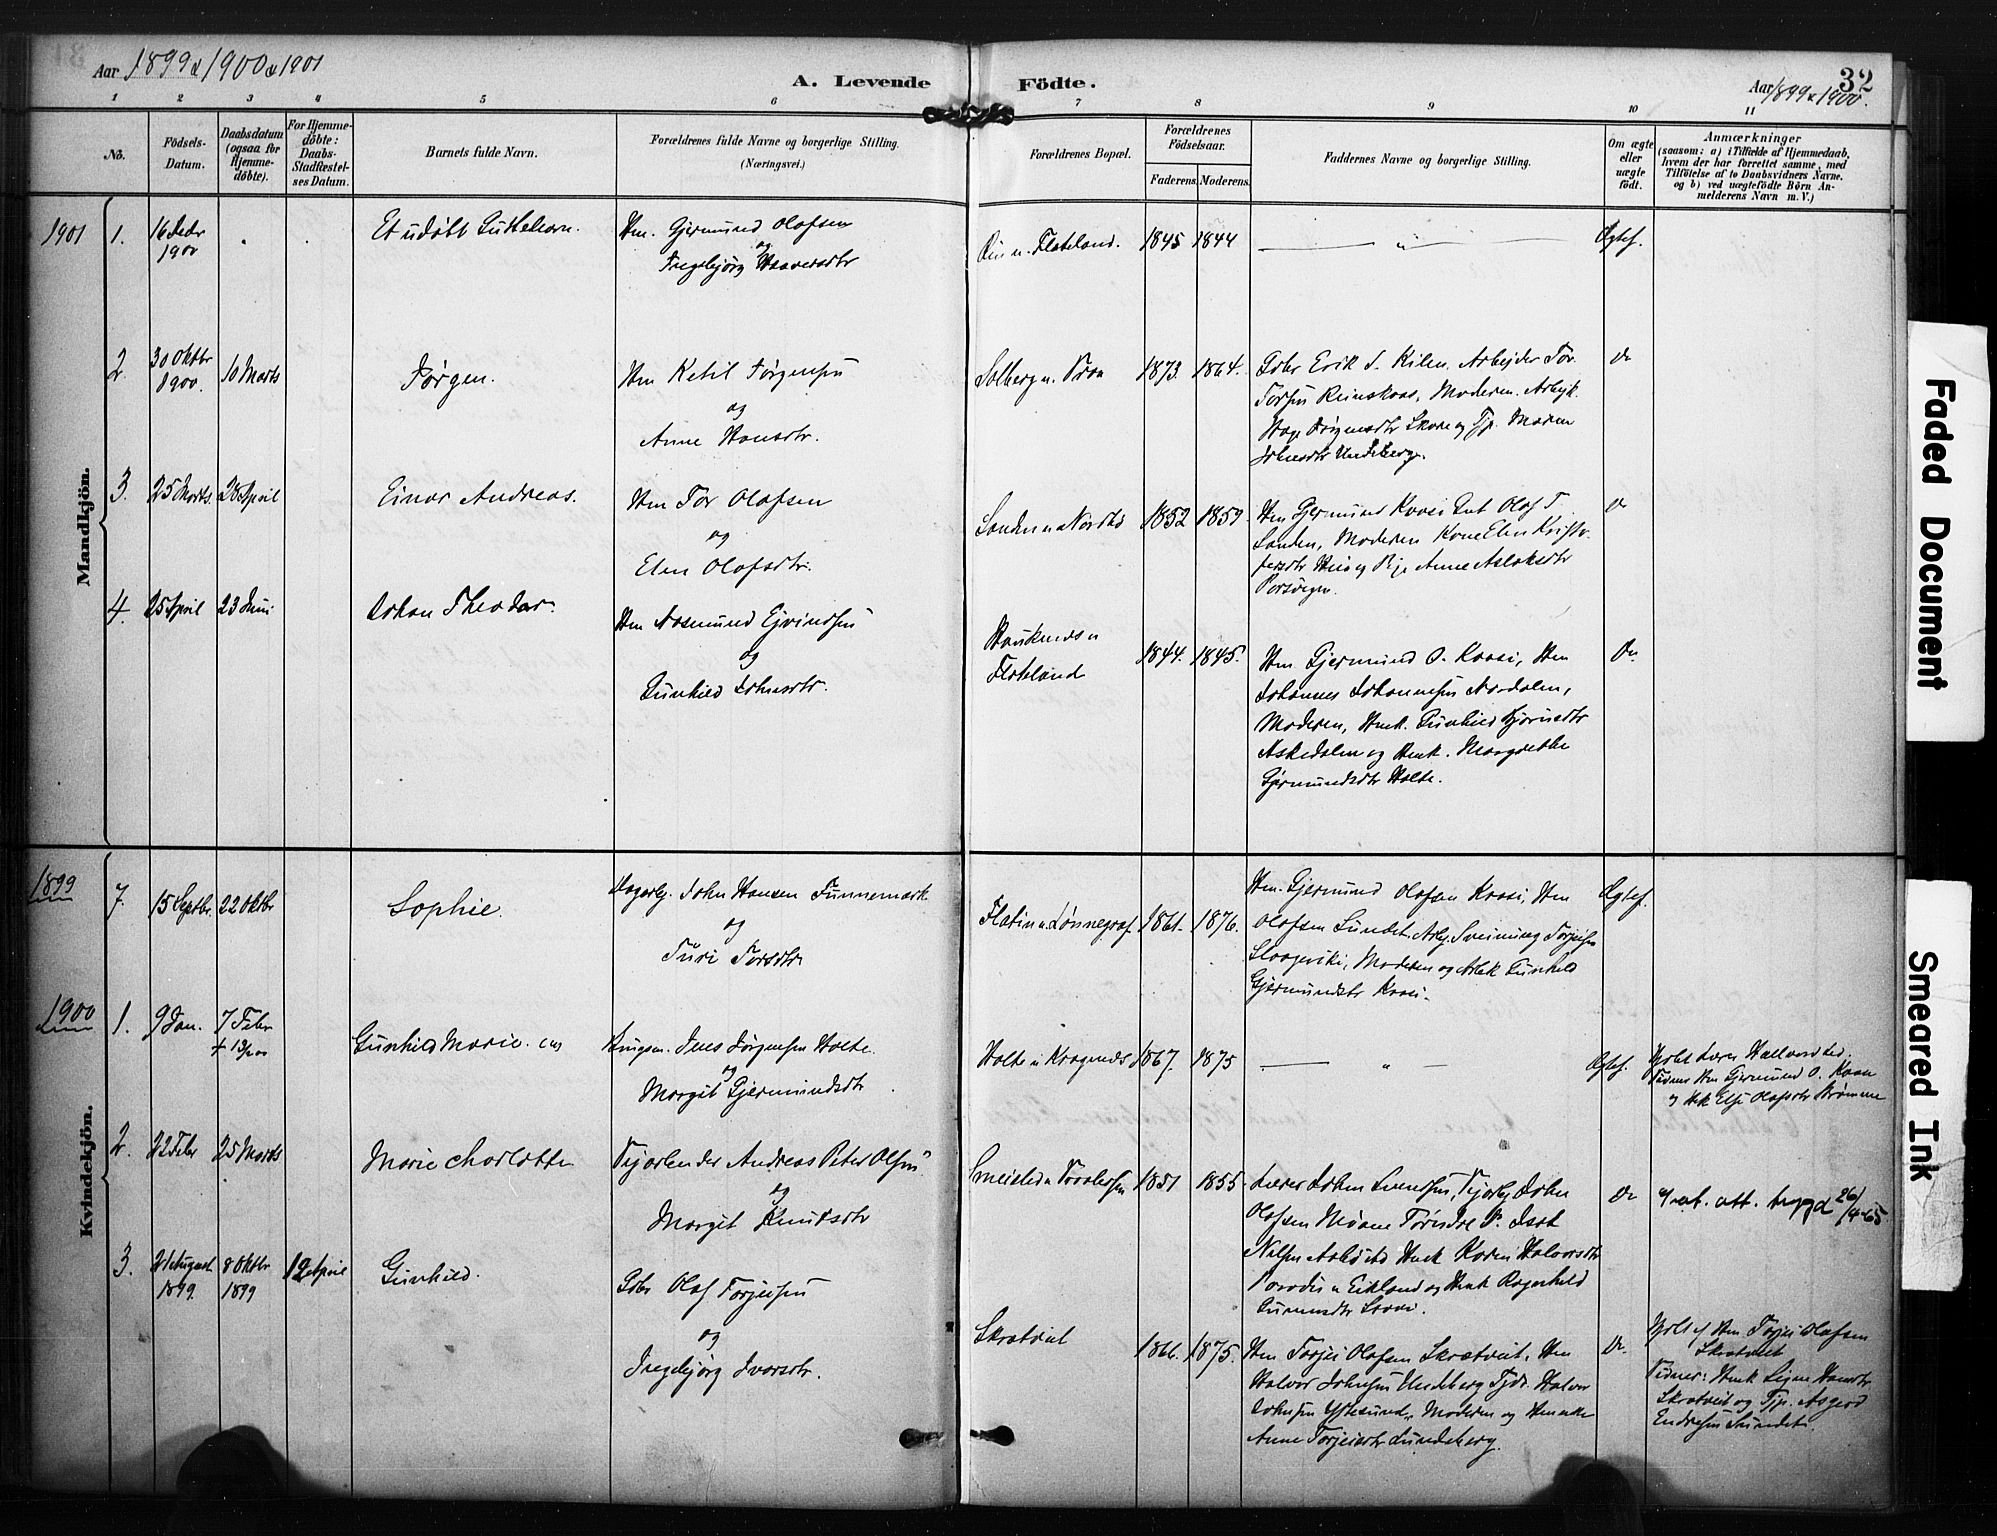 SAKO, Kviteseid kirkebøker, F/Fc/L0002: Ministerialbok nr. III 2, 1882-1908, s. 32